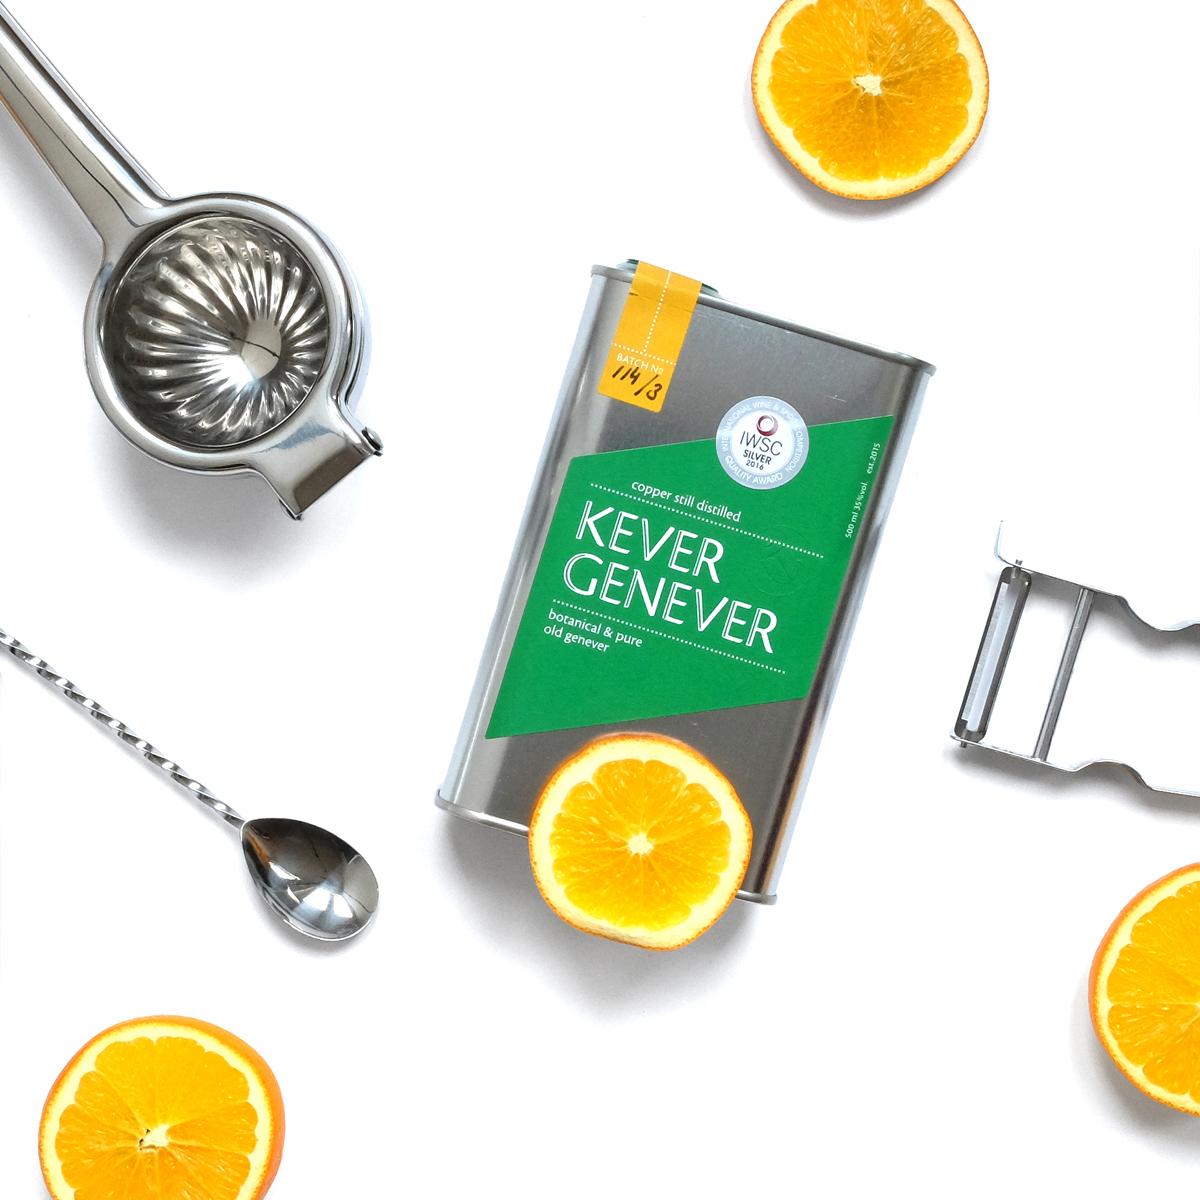 Kever Genever - food fotografie - content creator